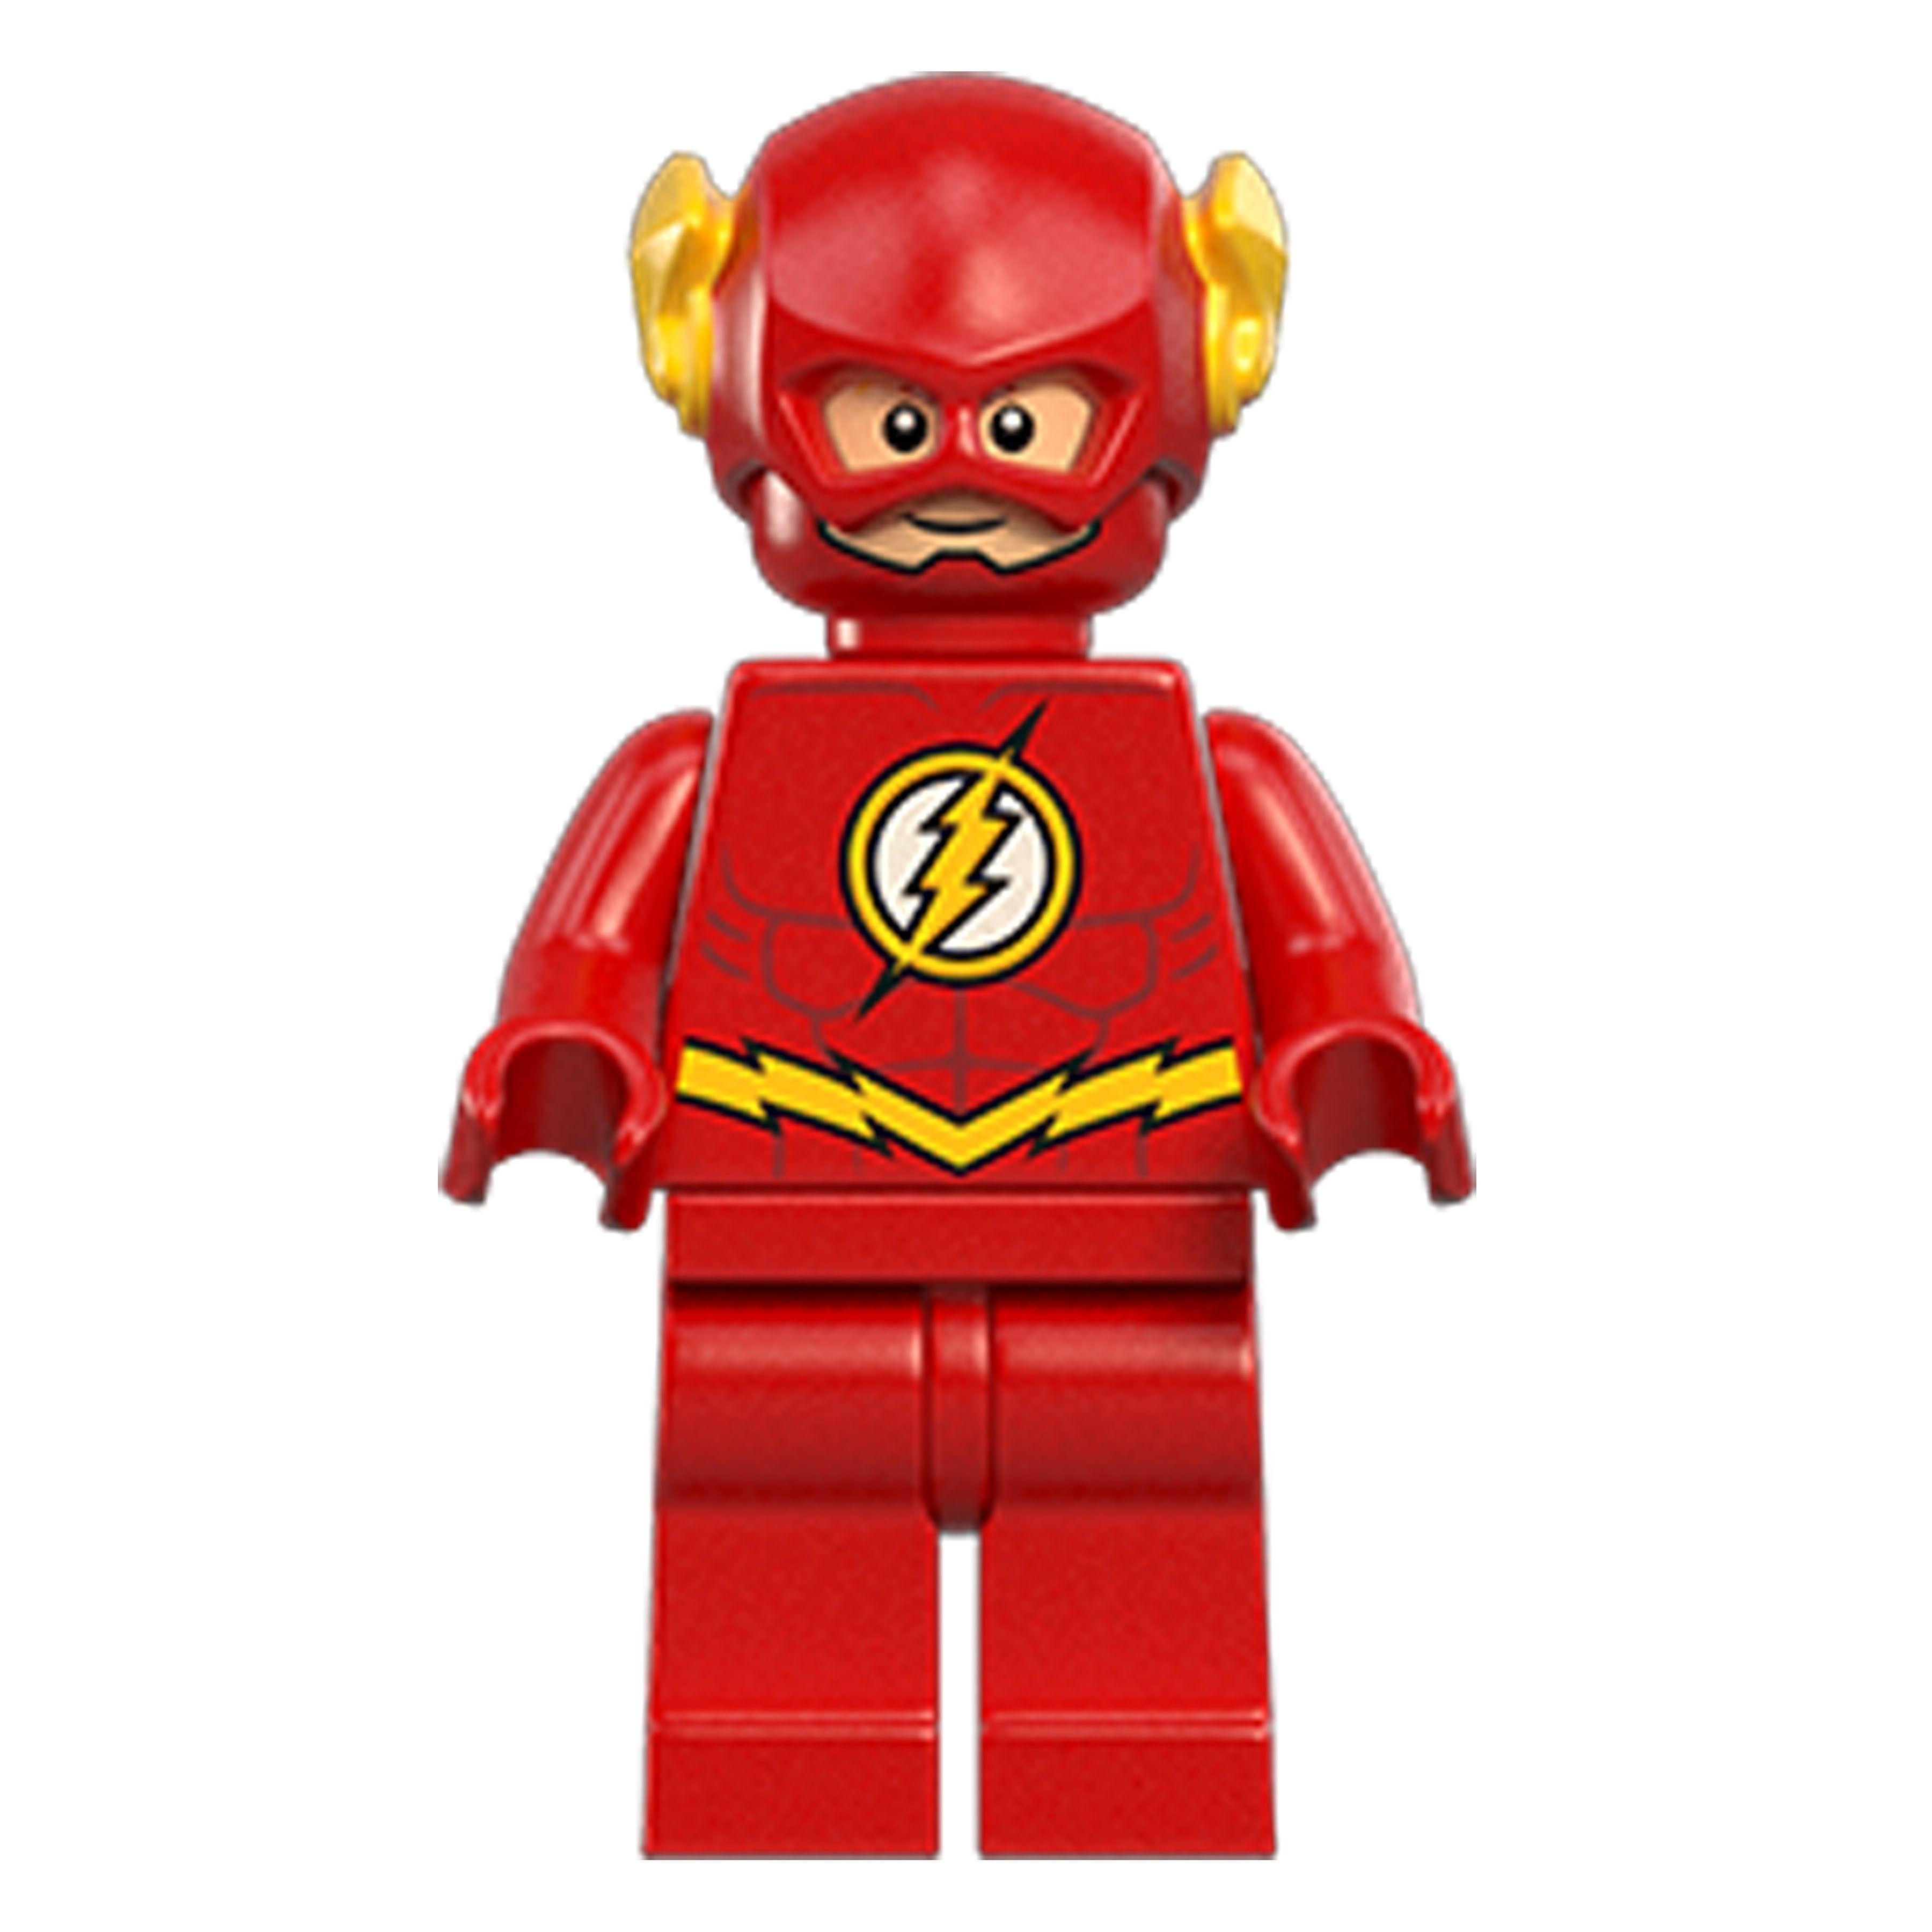 The Flash Minifigure from Lego set 76012 | holloween | Pinterest